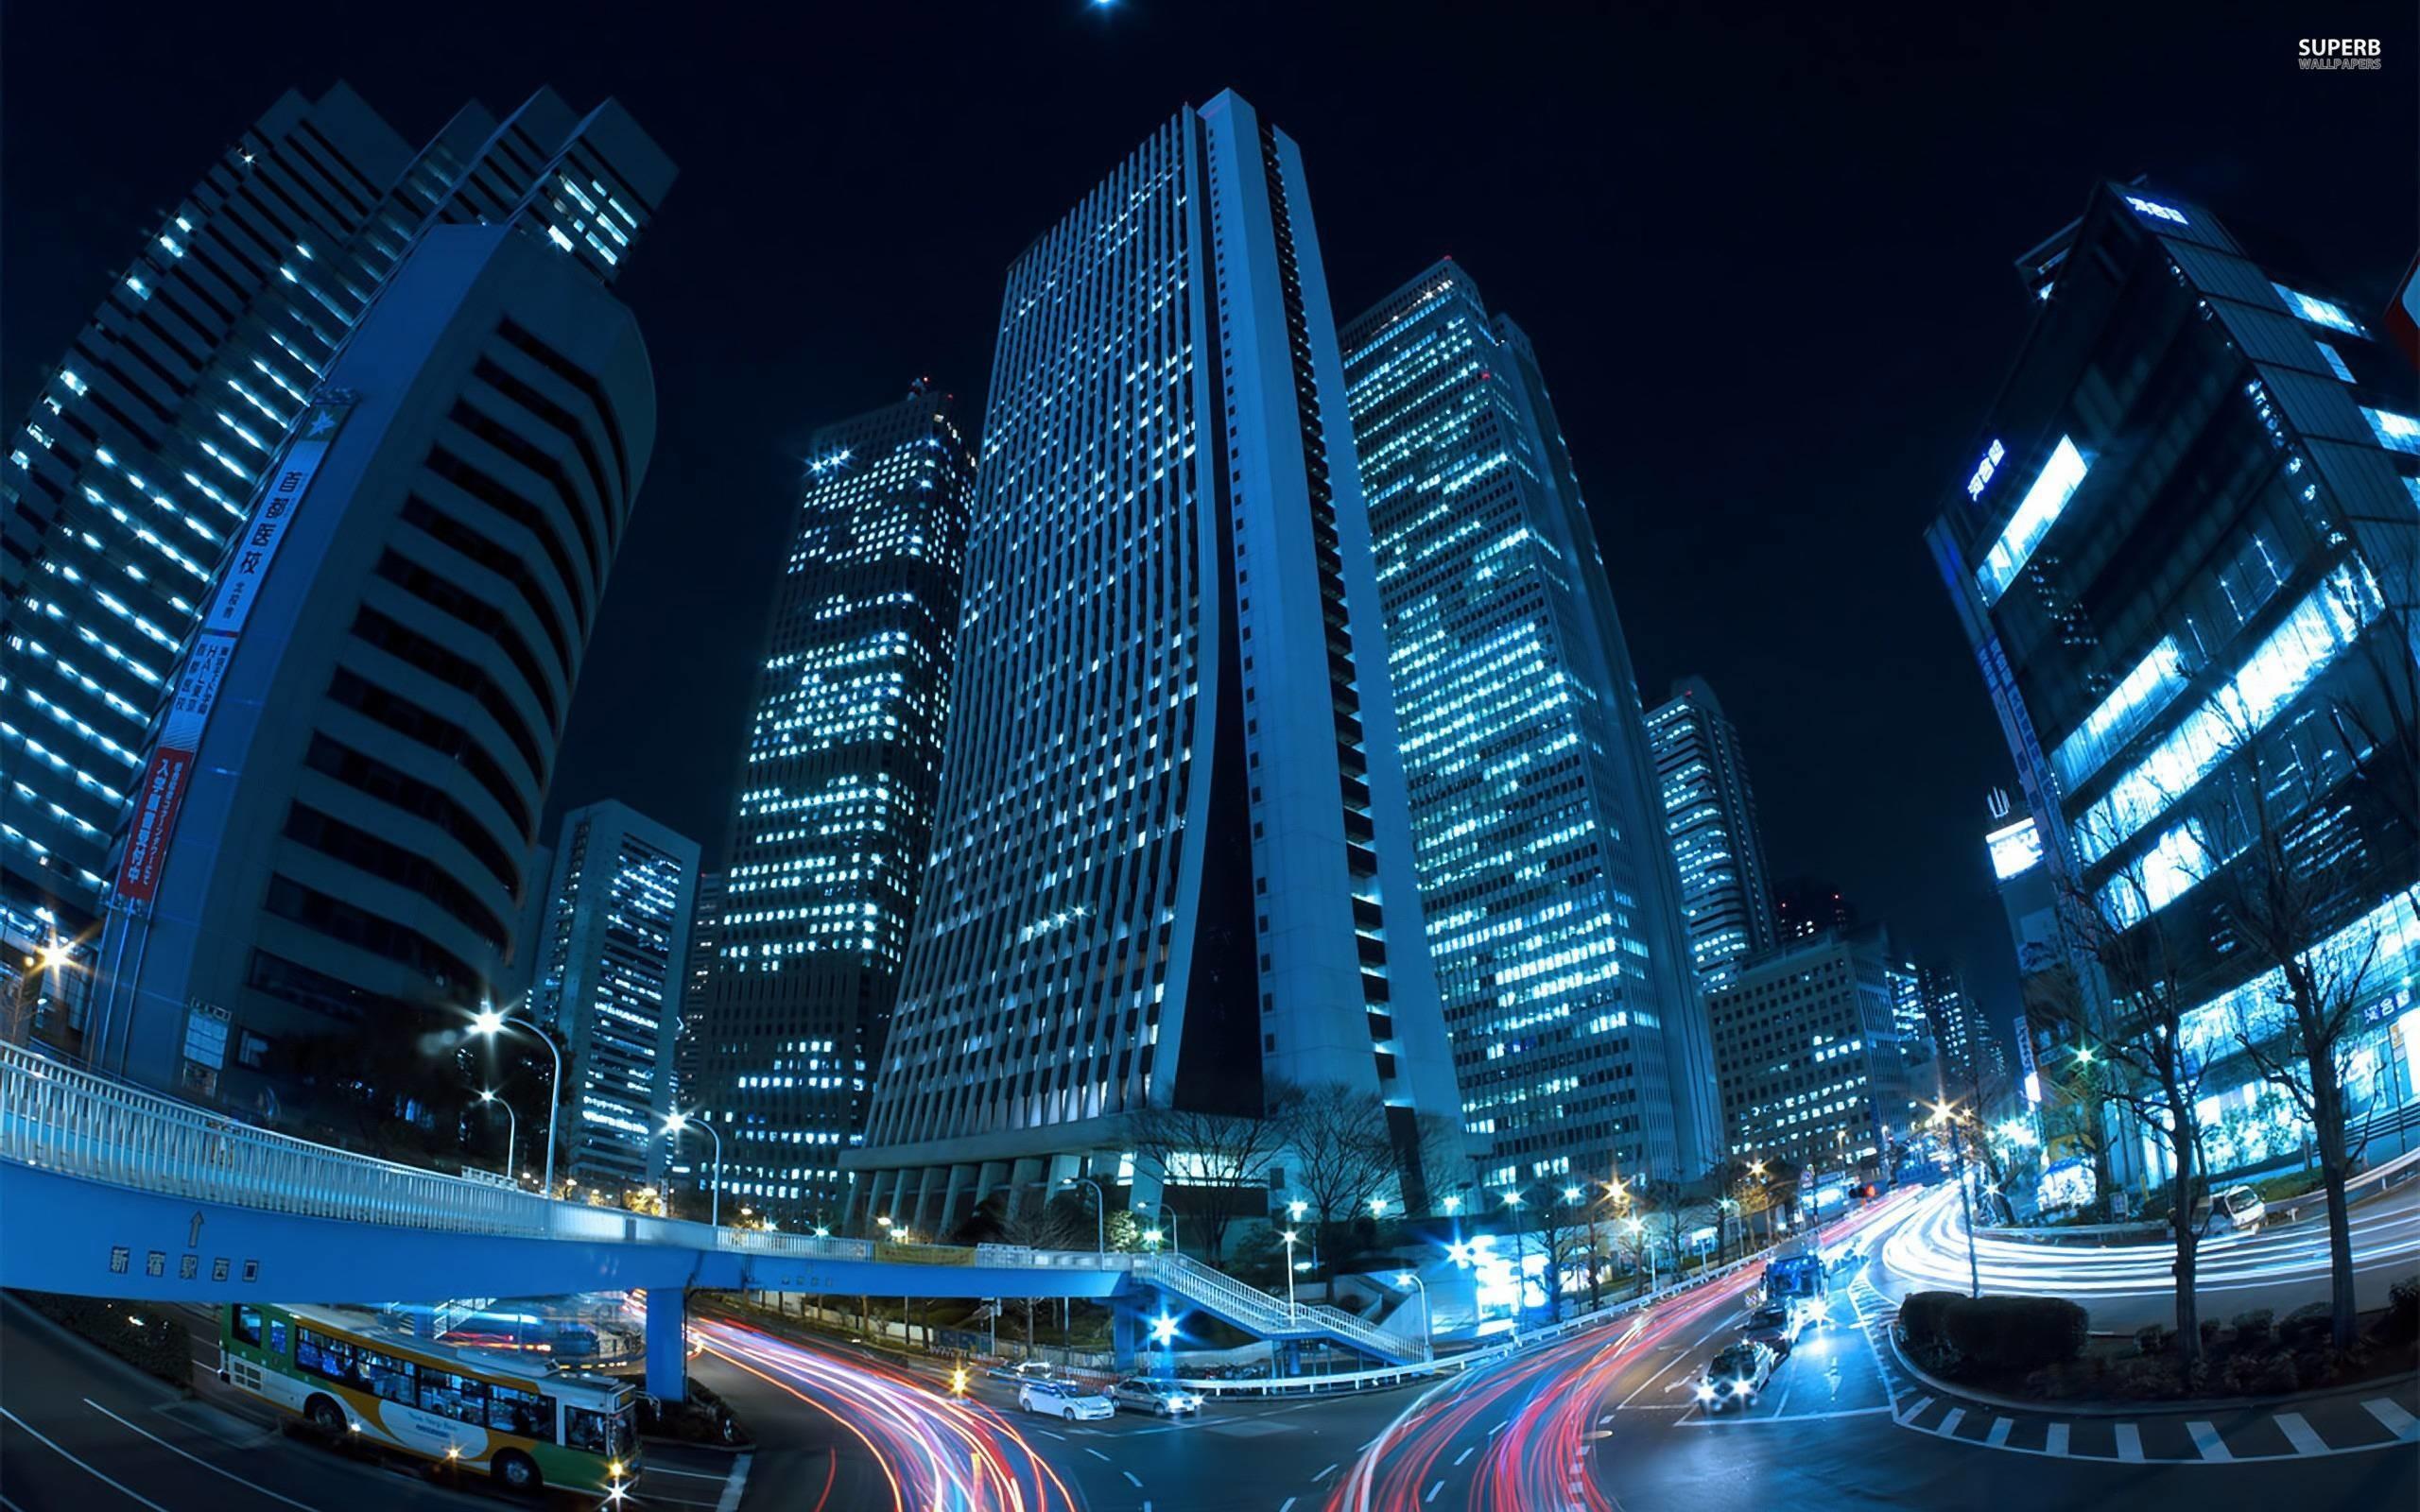 Tokyo Night Wallpapers High Resolution As Wallpaper HD